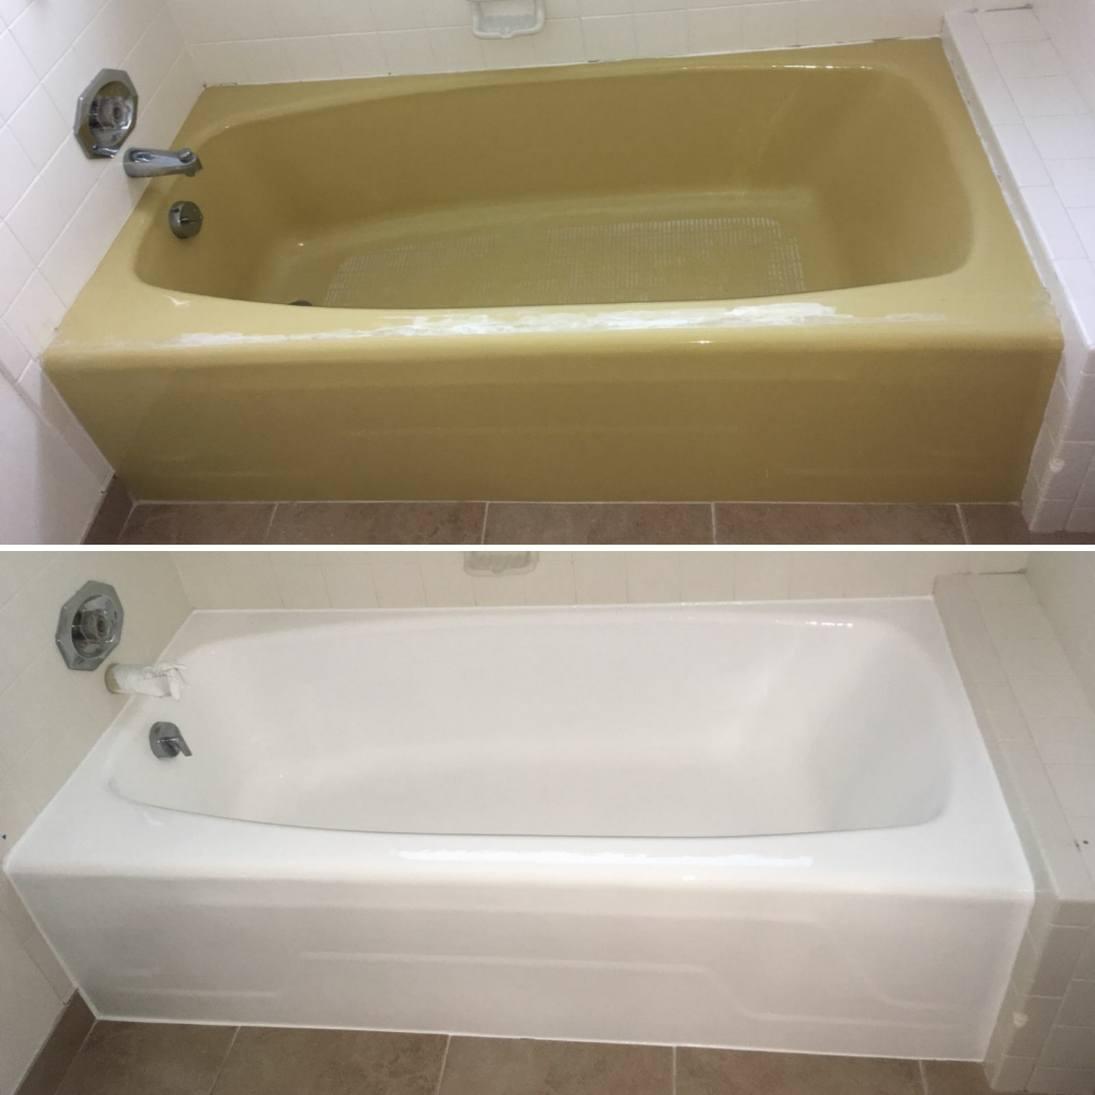 Genial Yellow Bathtub Refinished In White By America Refinishing Pros